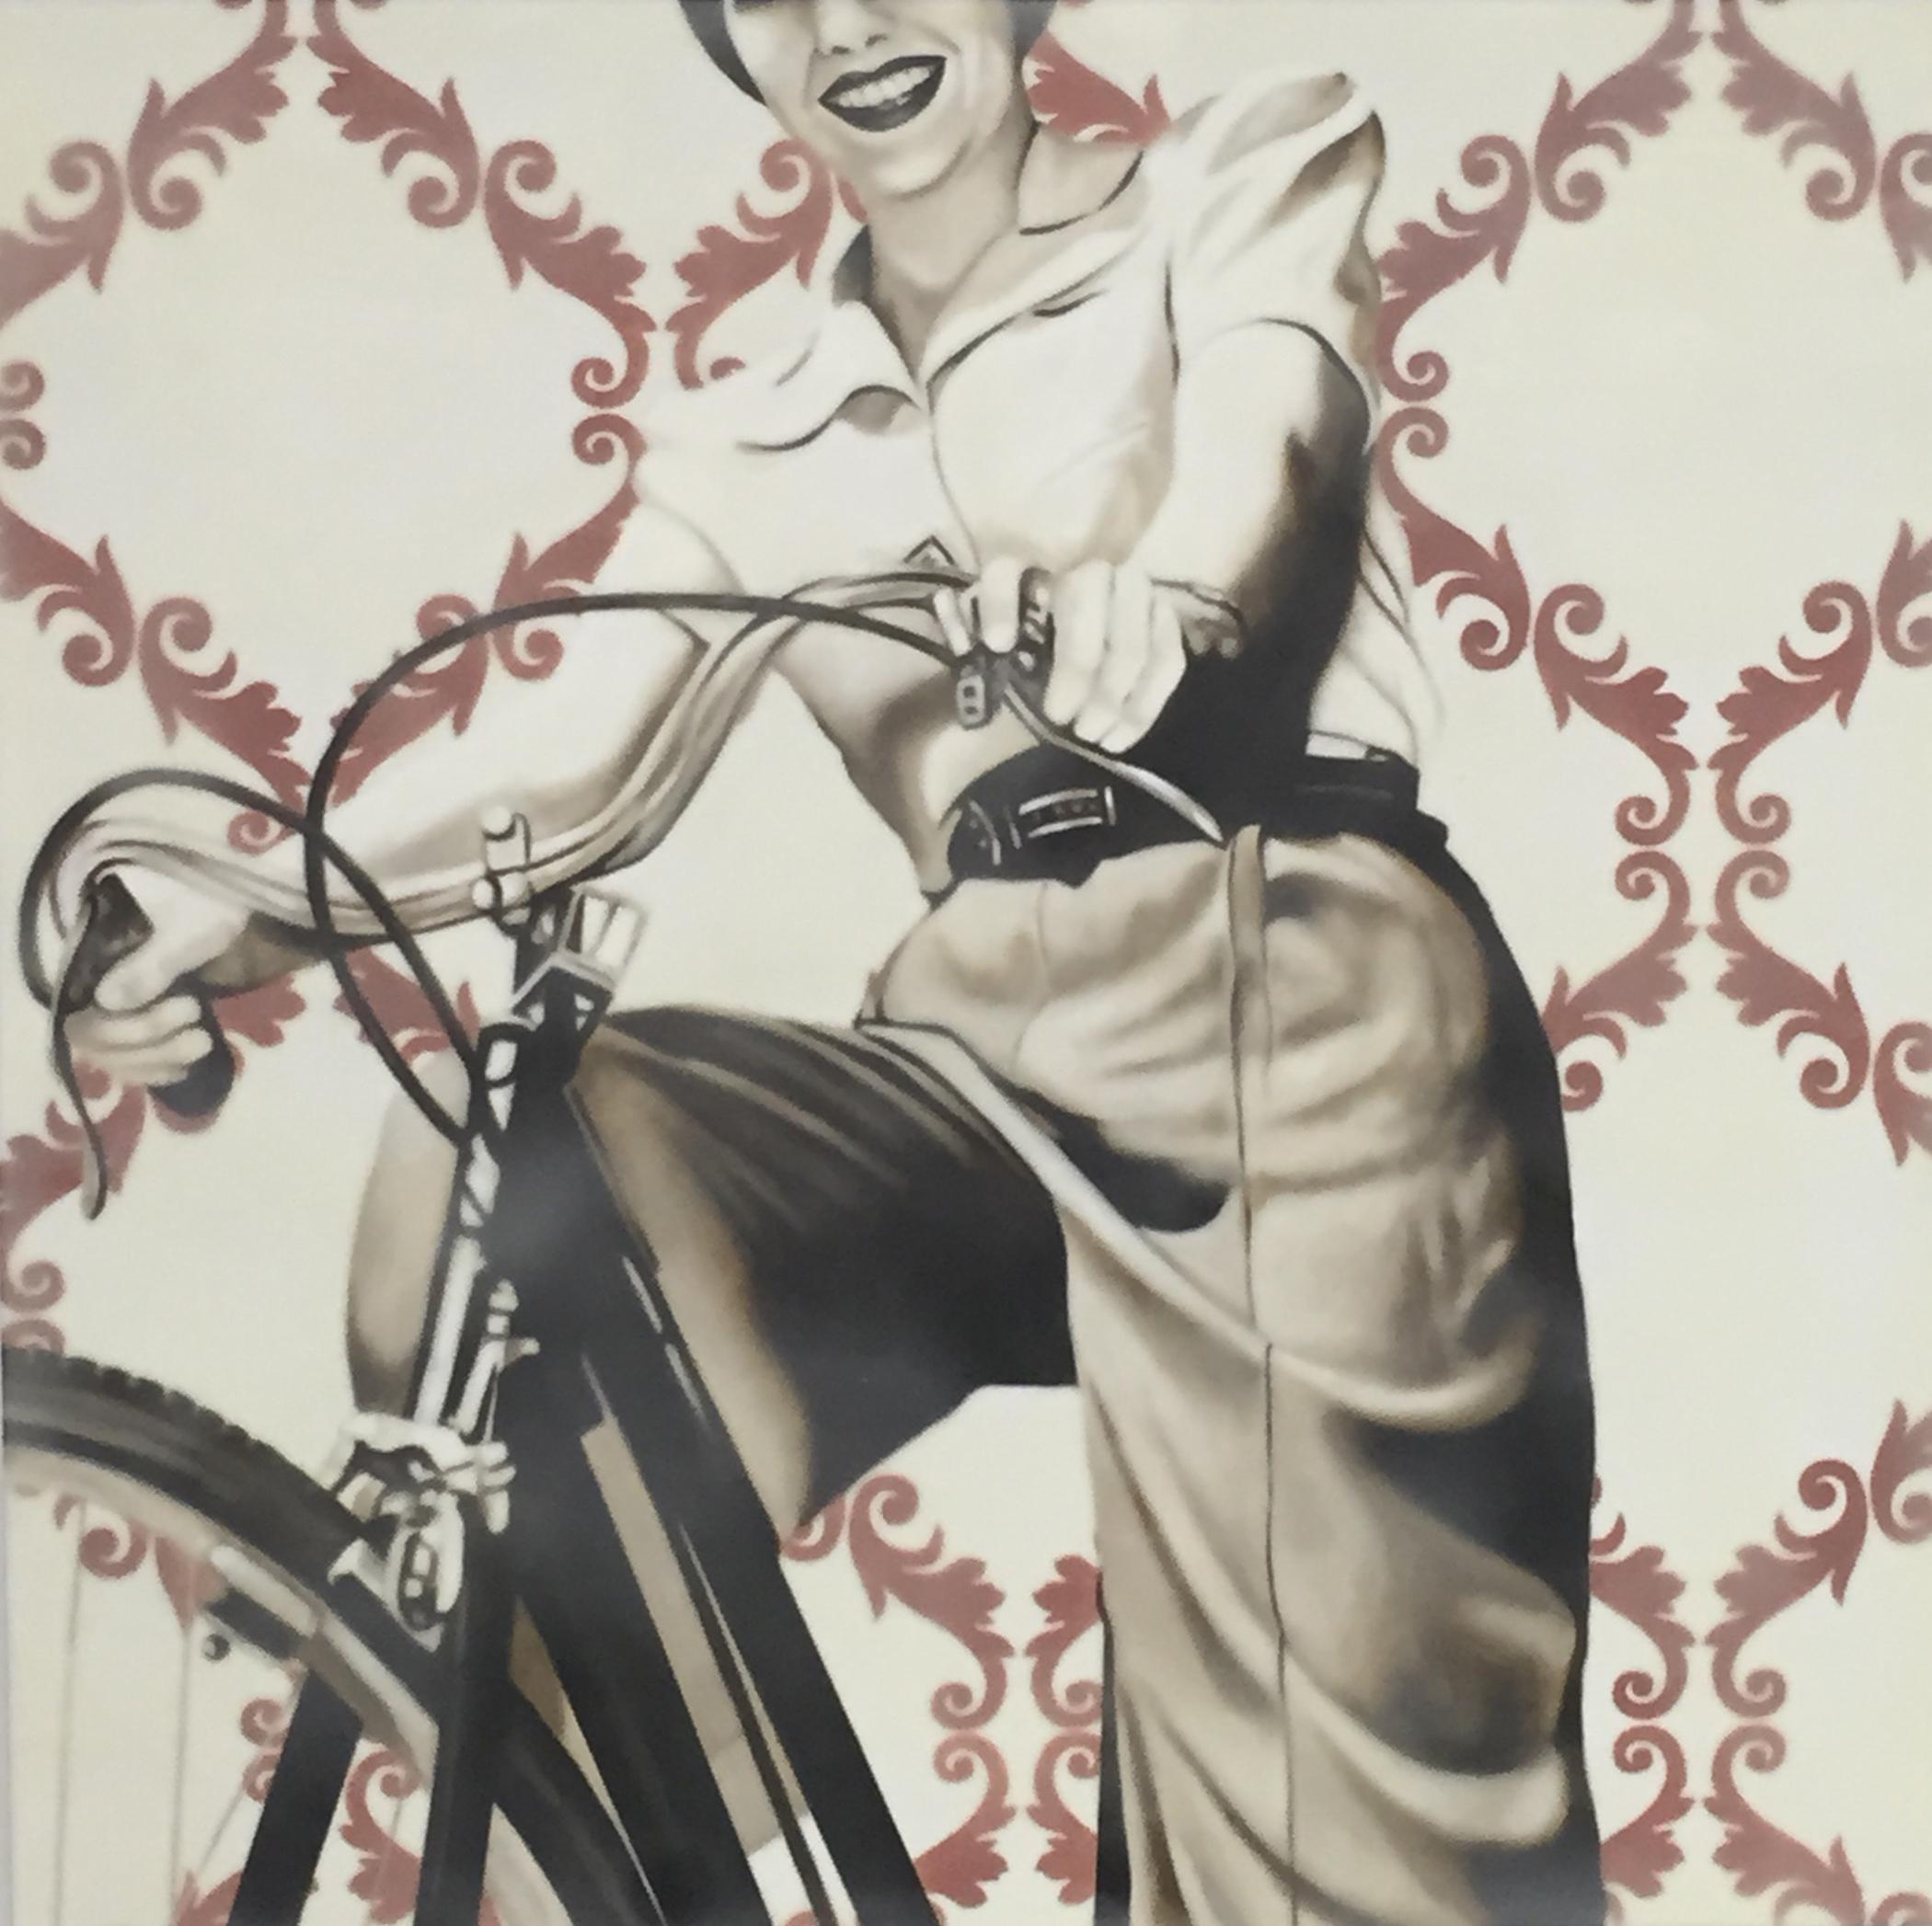 Bike Ride 30x30 (oil and encaustic wax) | Courtesy of Jhina Alvarado